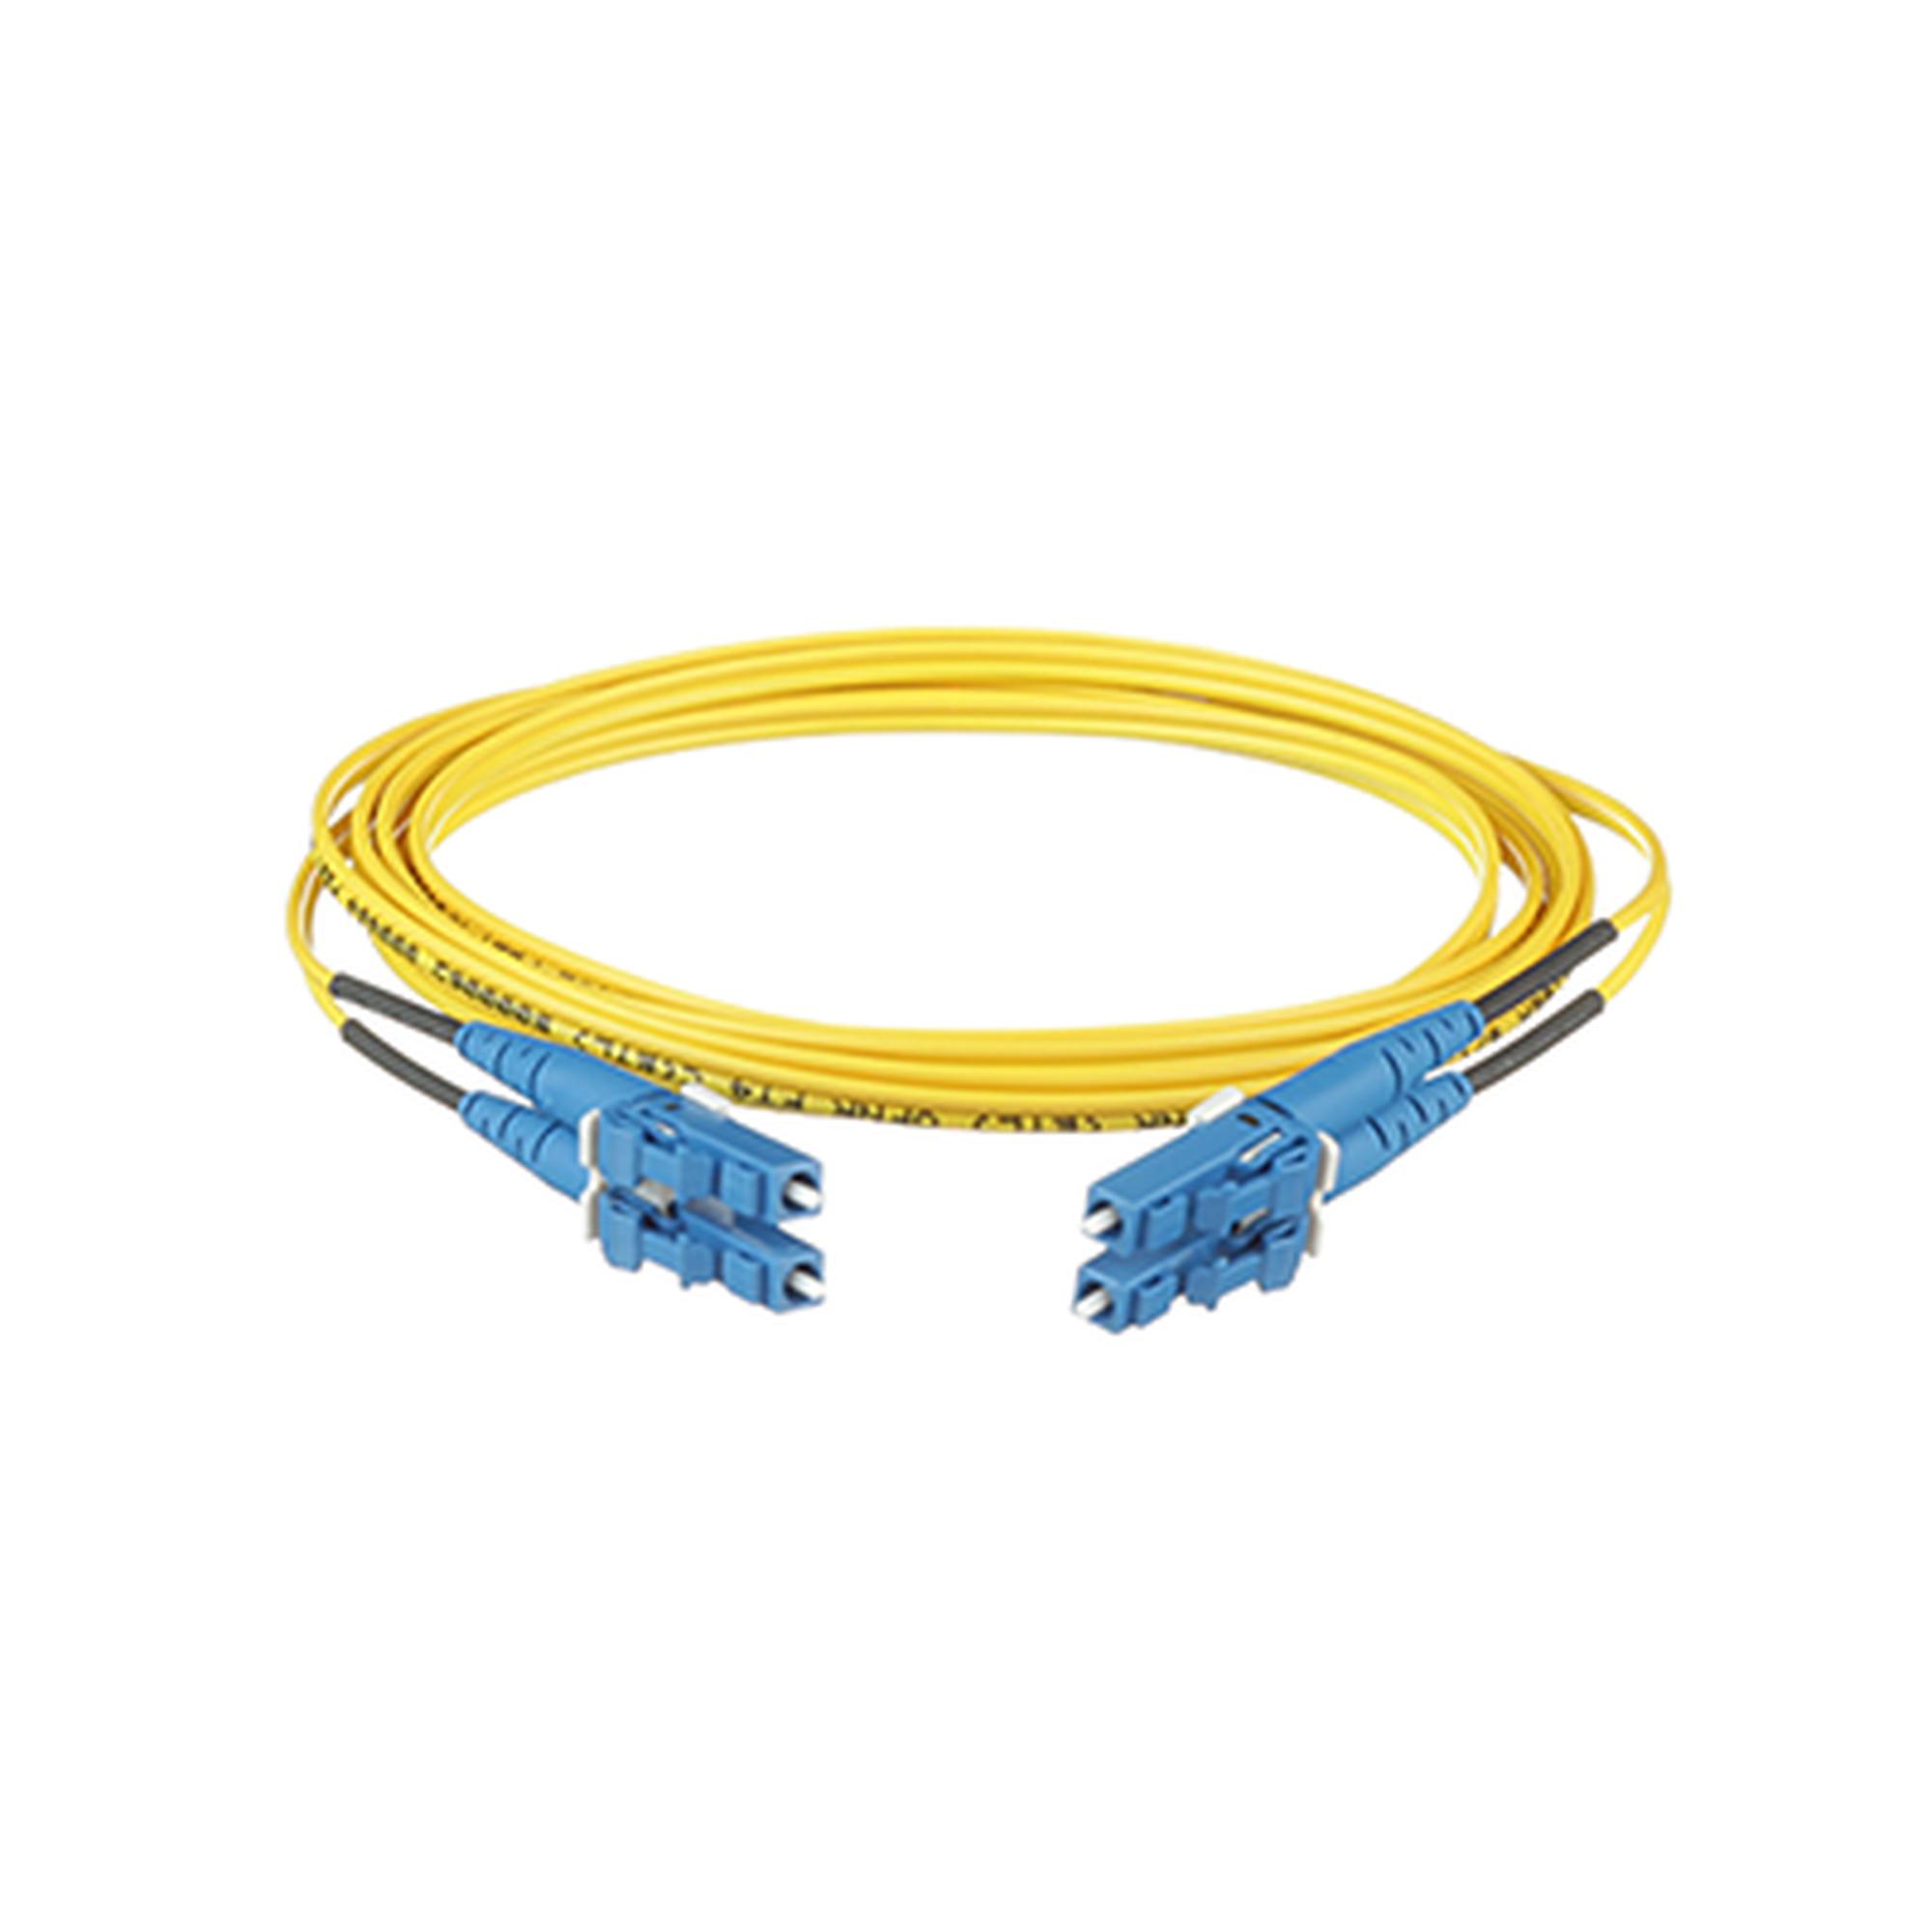 Jumper de Fibra Optica Monomodo 9/125 OS2, LC-LC Duplex, OFNR (Riser), Color Amarillo, 3 Metros